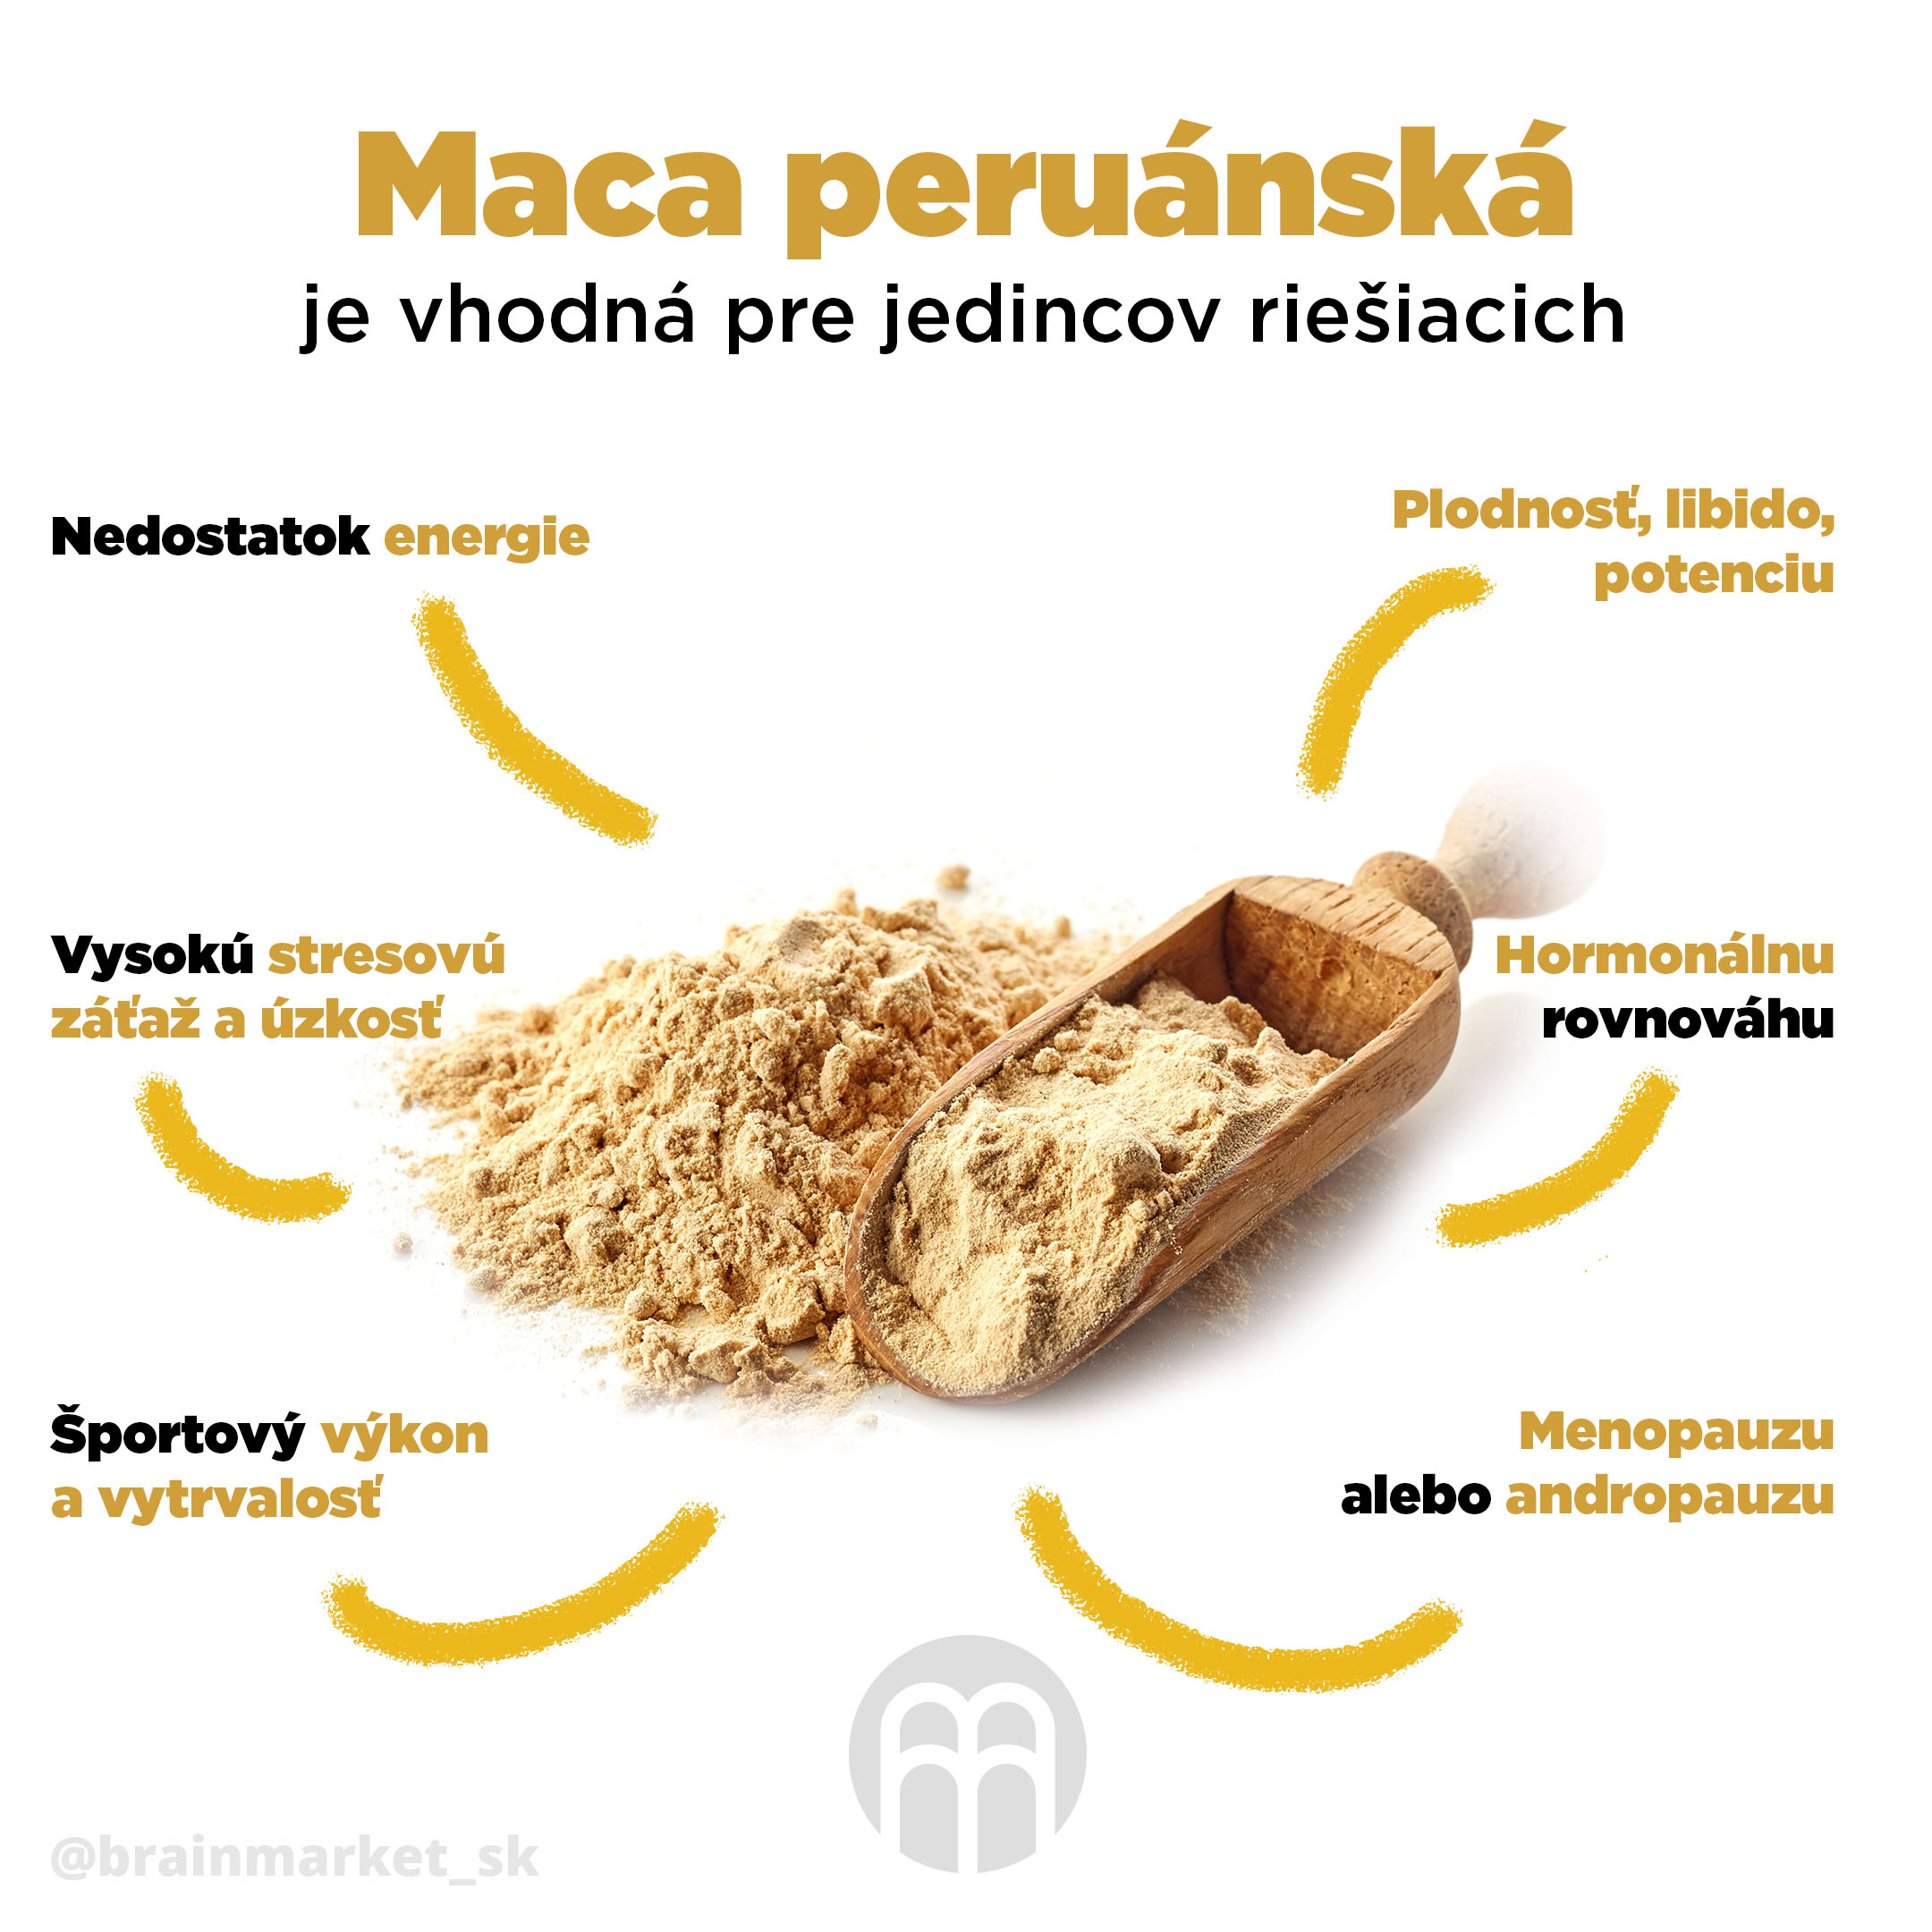 maca_peruanska_Infografika-BrainMarket_SK